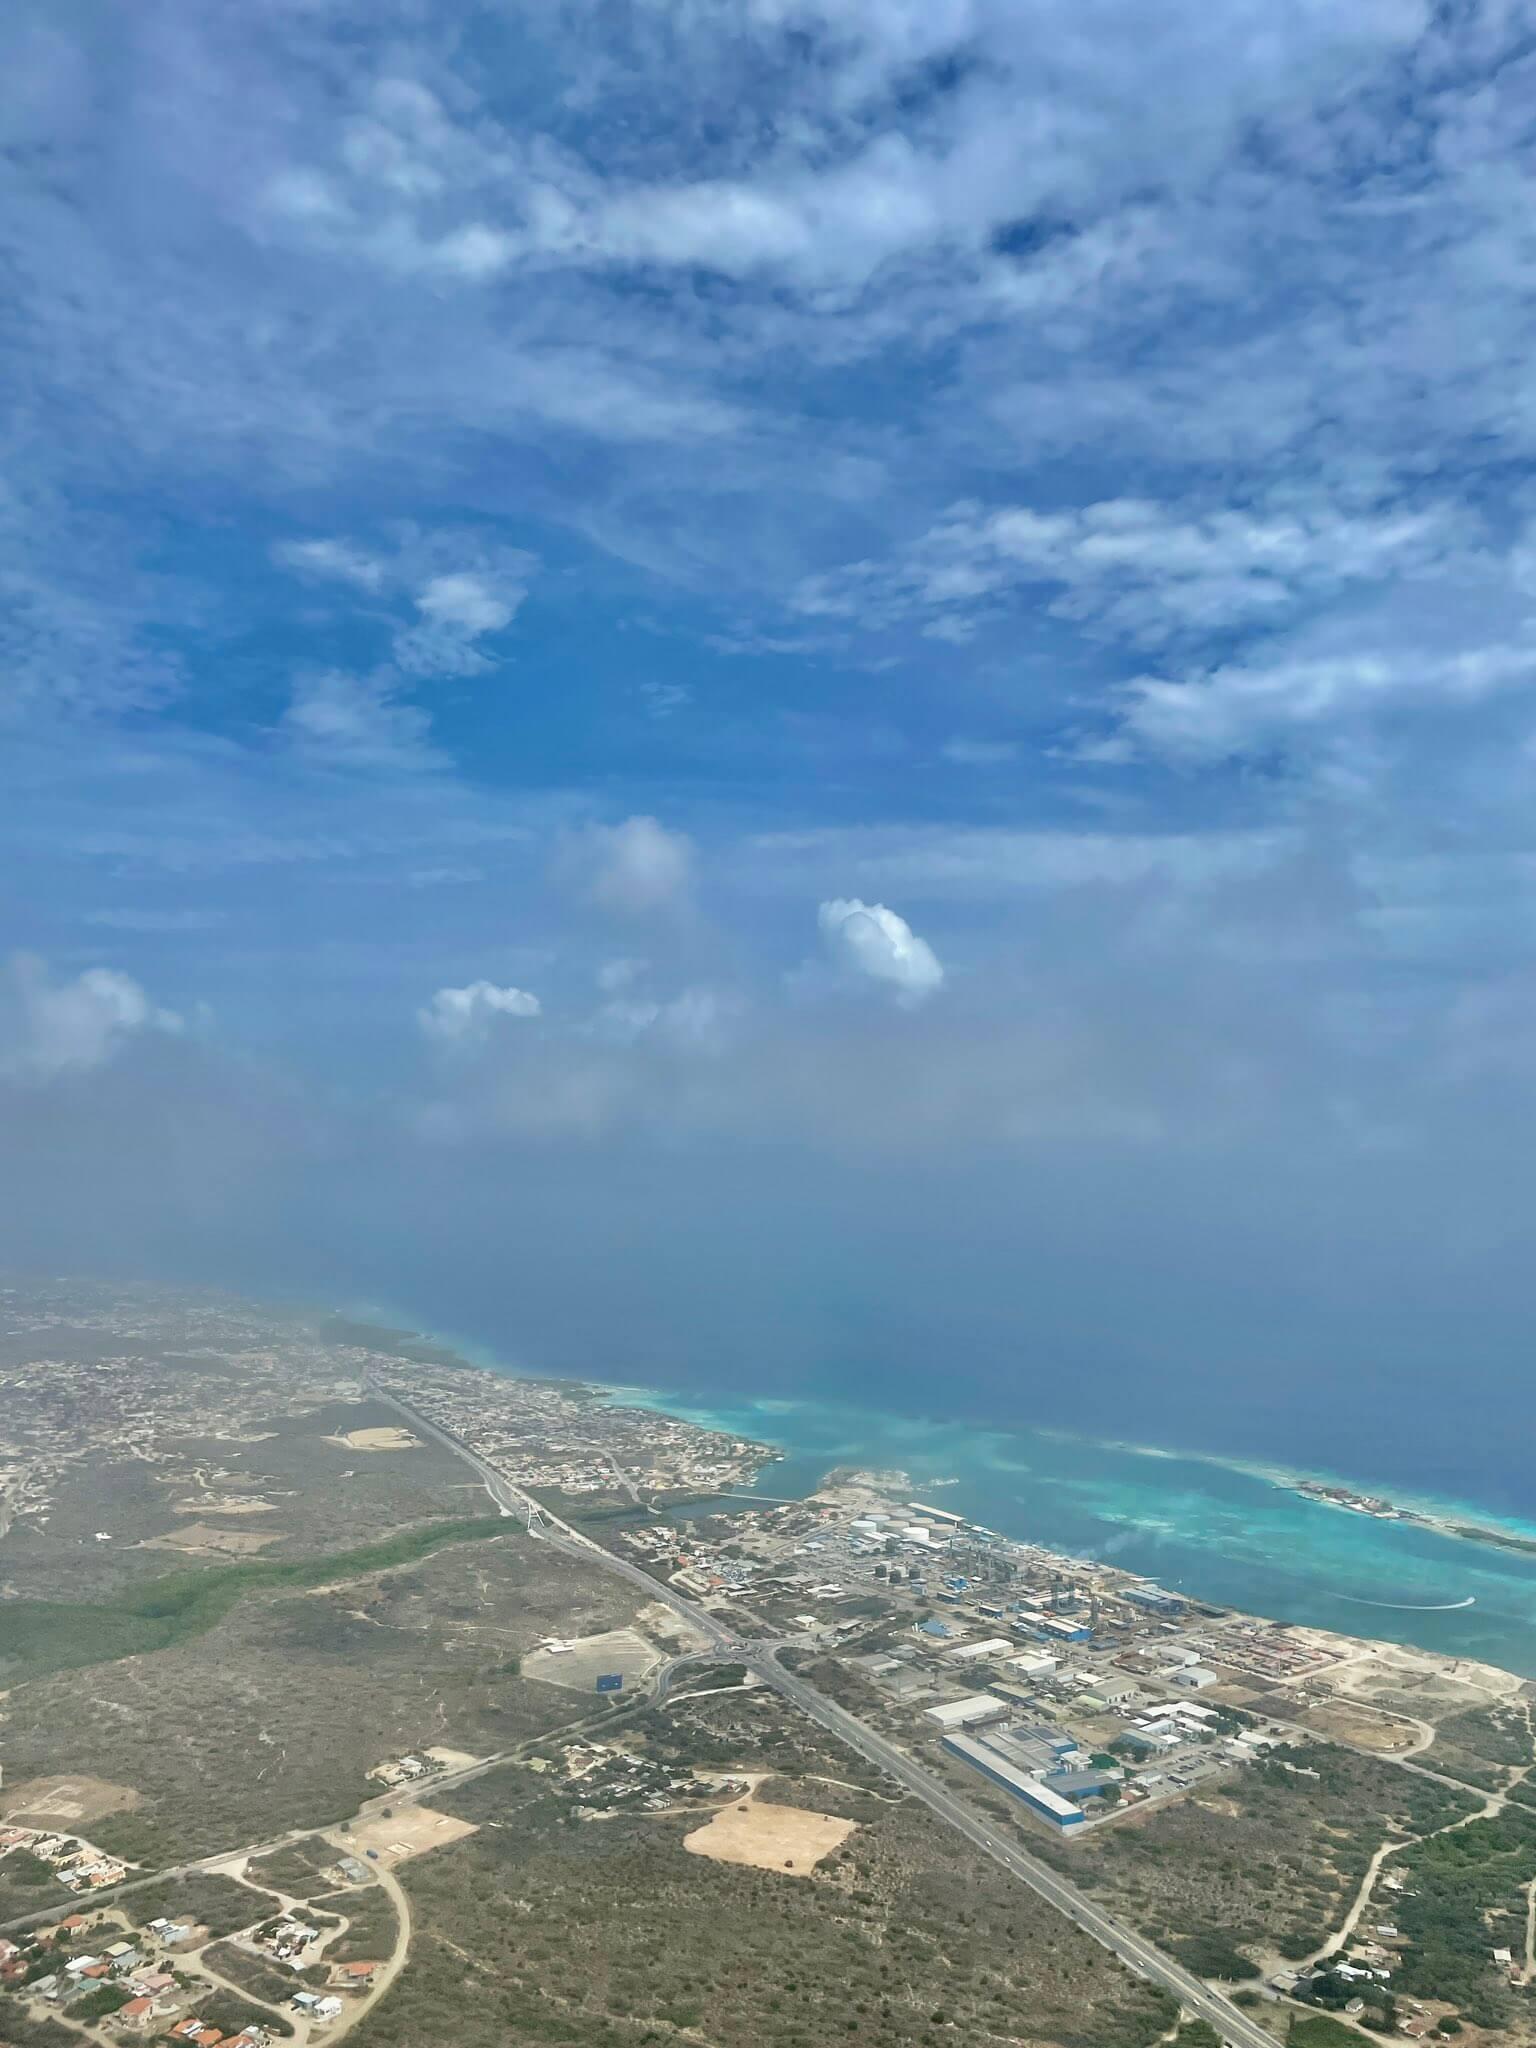 saharan-air-layer-event-aruba-photo-dust-haze